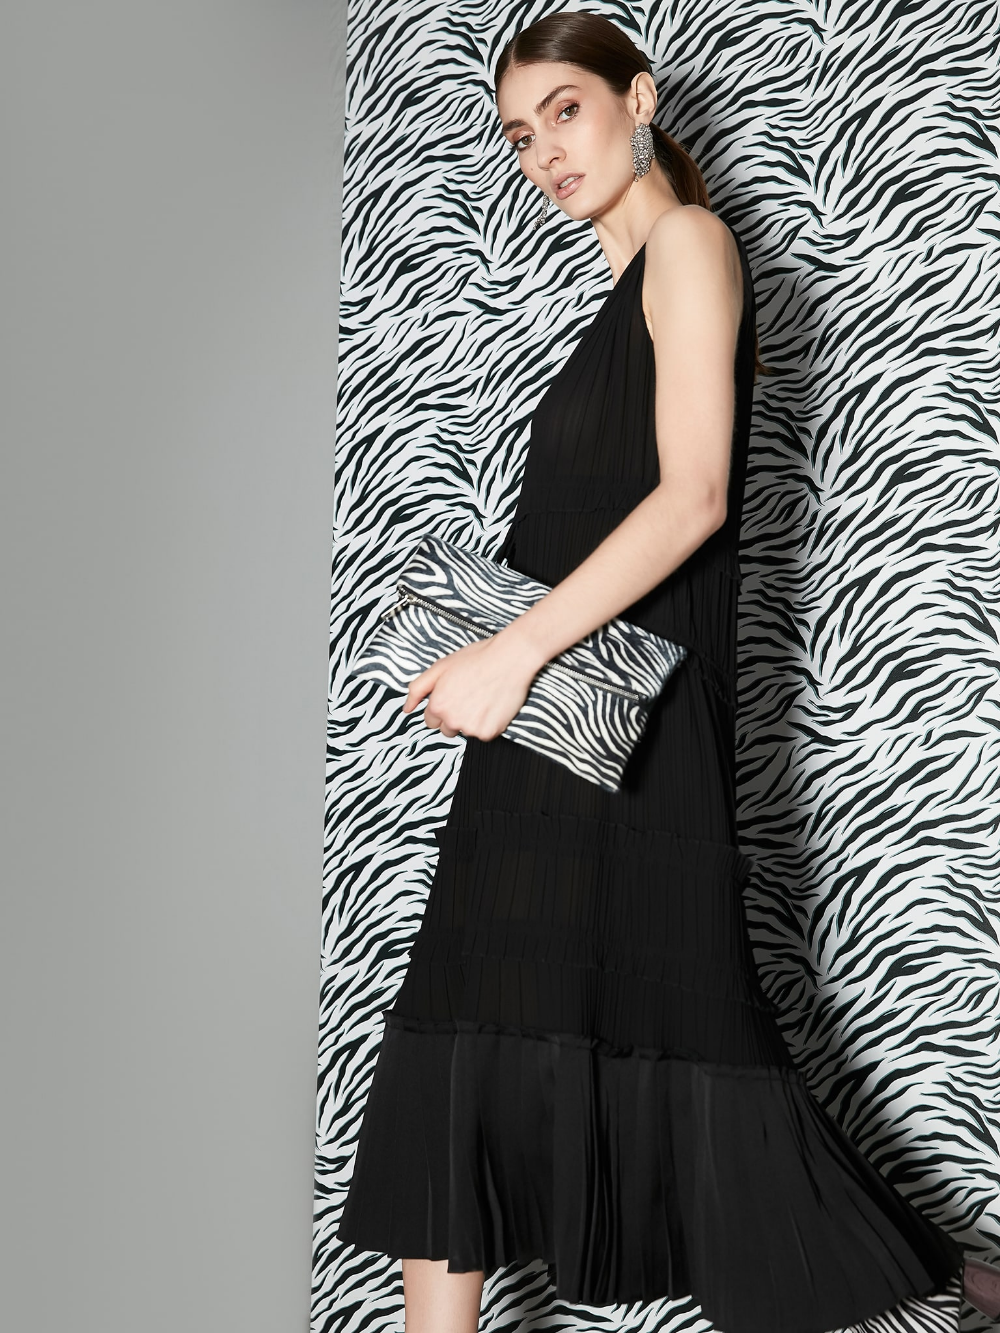 Siyah Firfir Seritli Pilisole Elbise Iw6190002107001 Ipekyol Elbise Moda Stilleri Gomlek Elbise